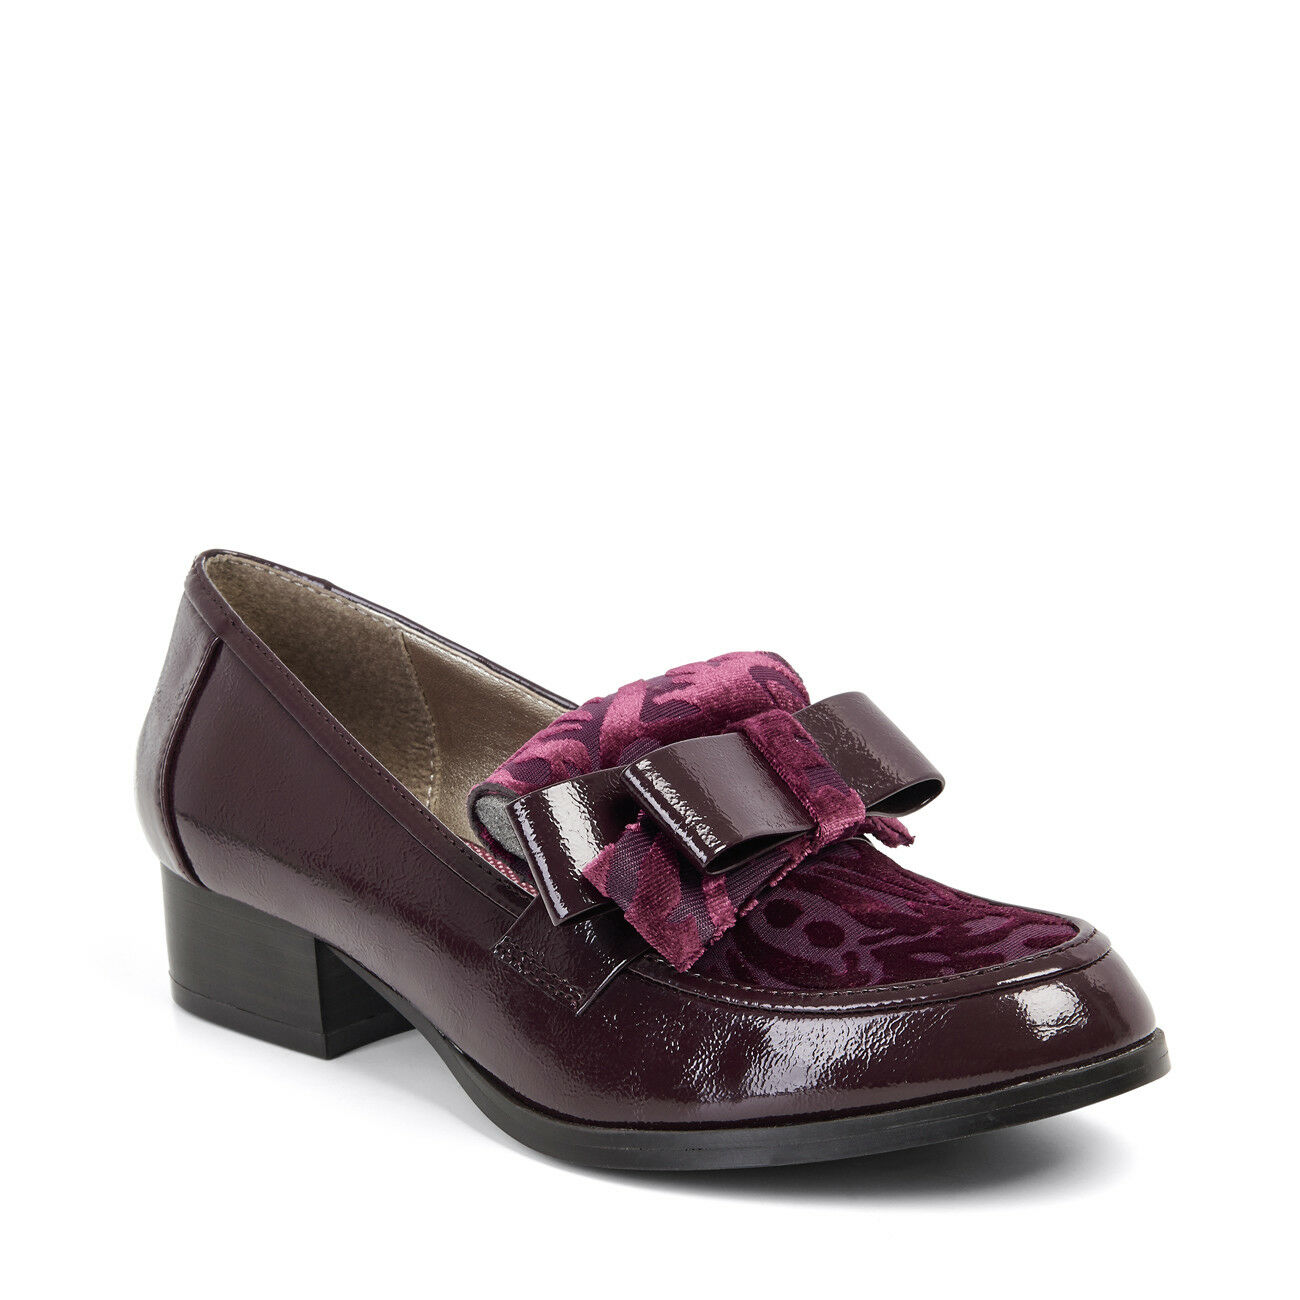 NEW Ruby Shoo Gabriella Flat Loafer Black Navy UK3-9 UK3-9 UK3-9 EU36-42 5d7265